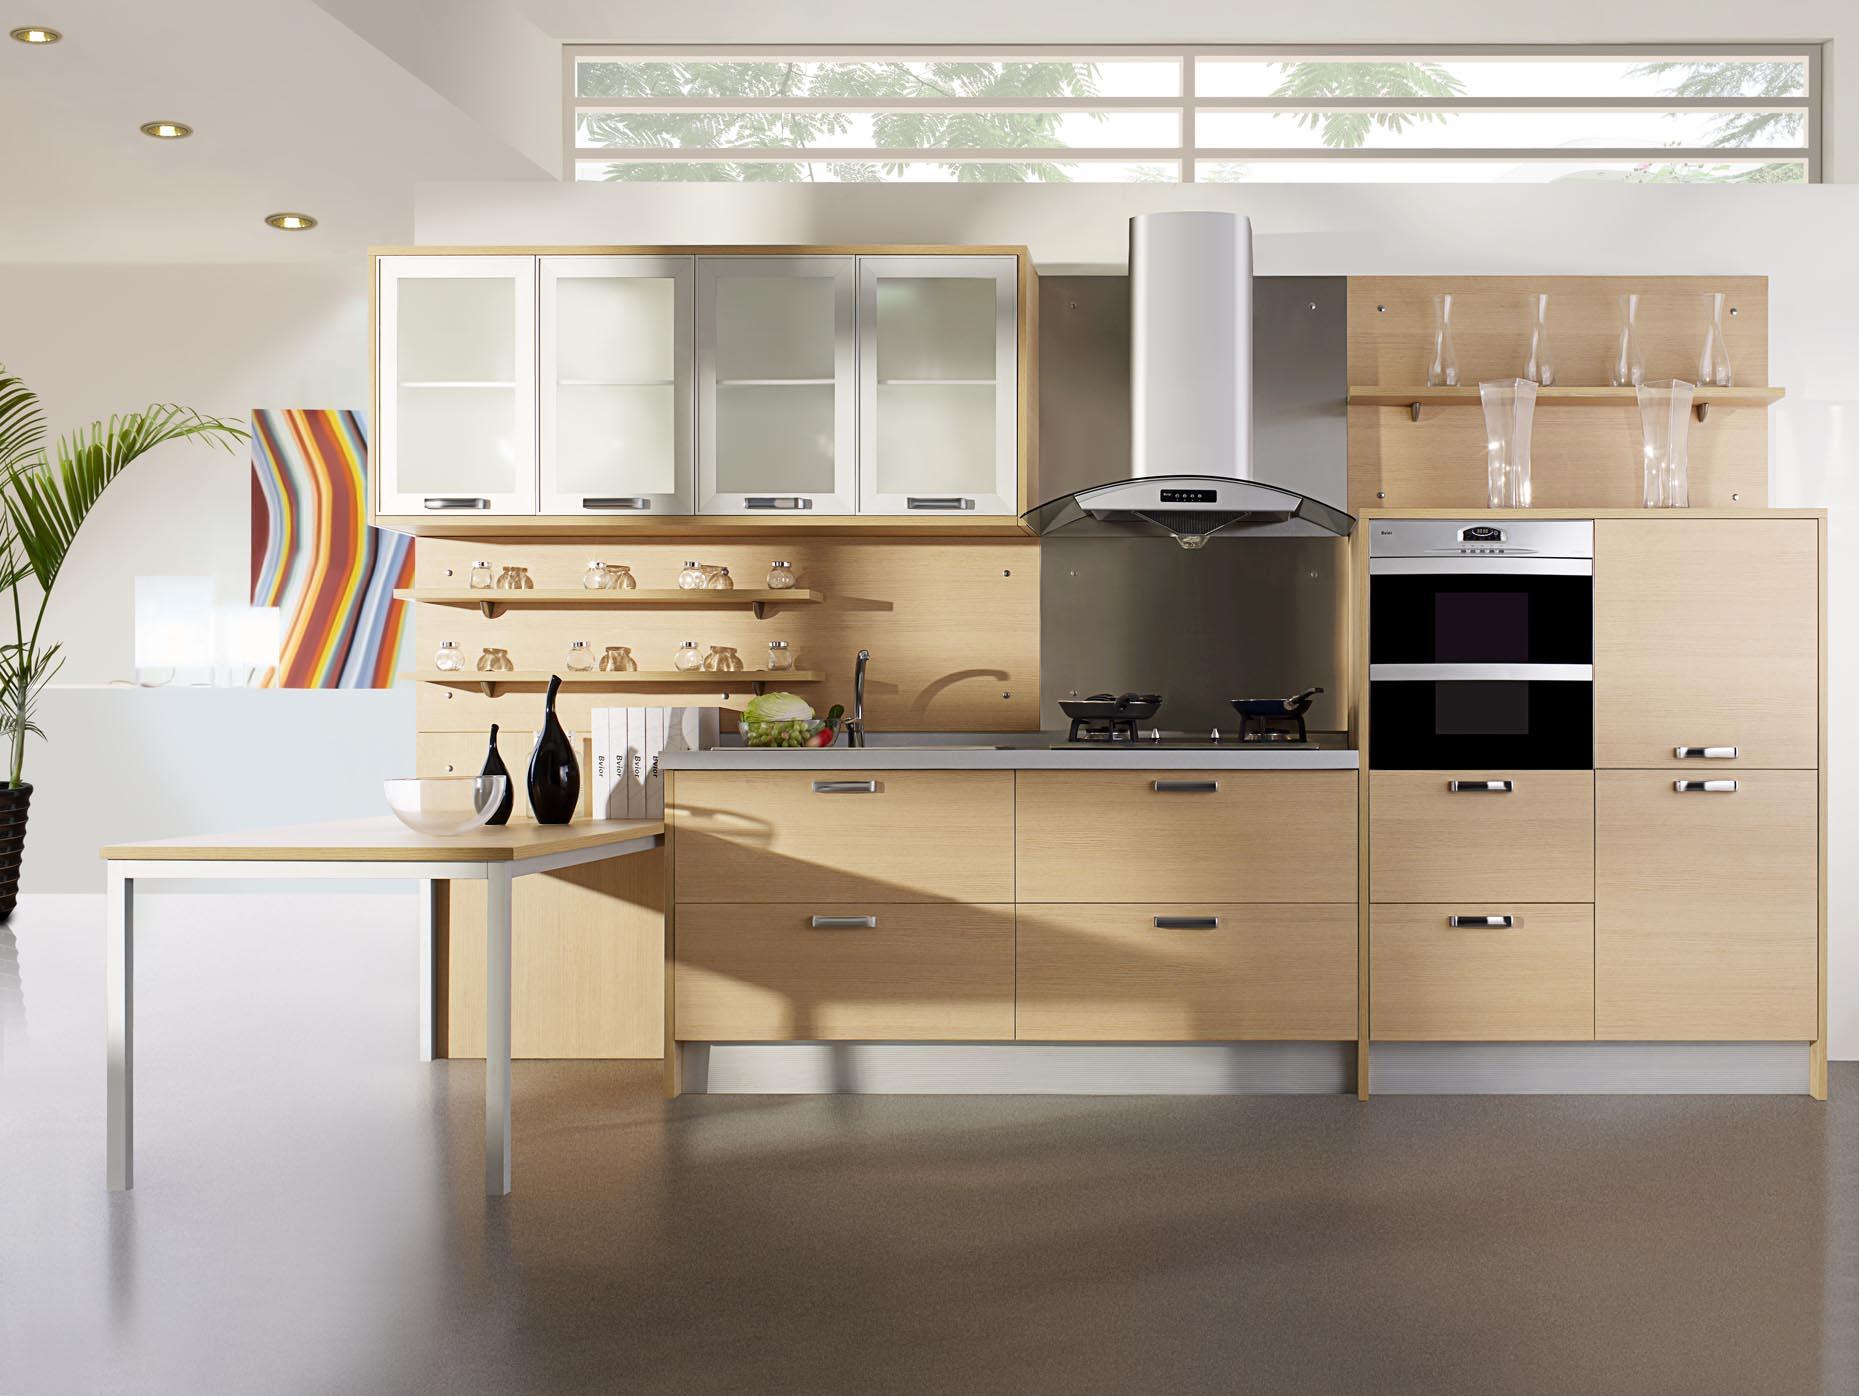 Black kitchen appliances Photo - 12